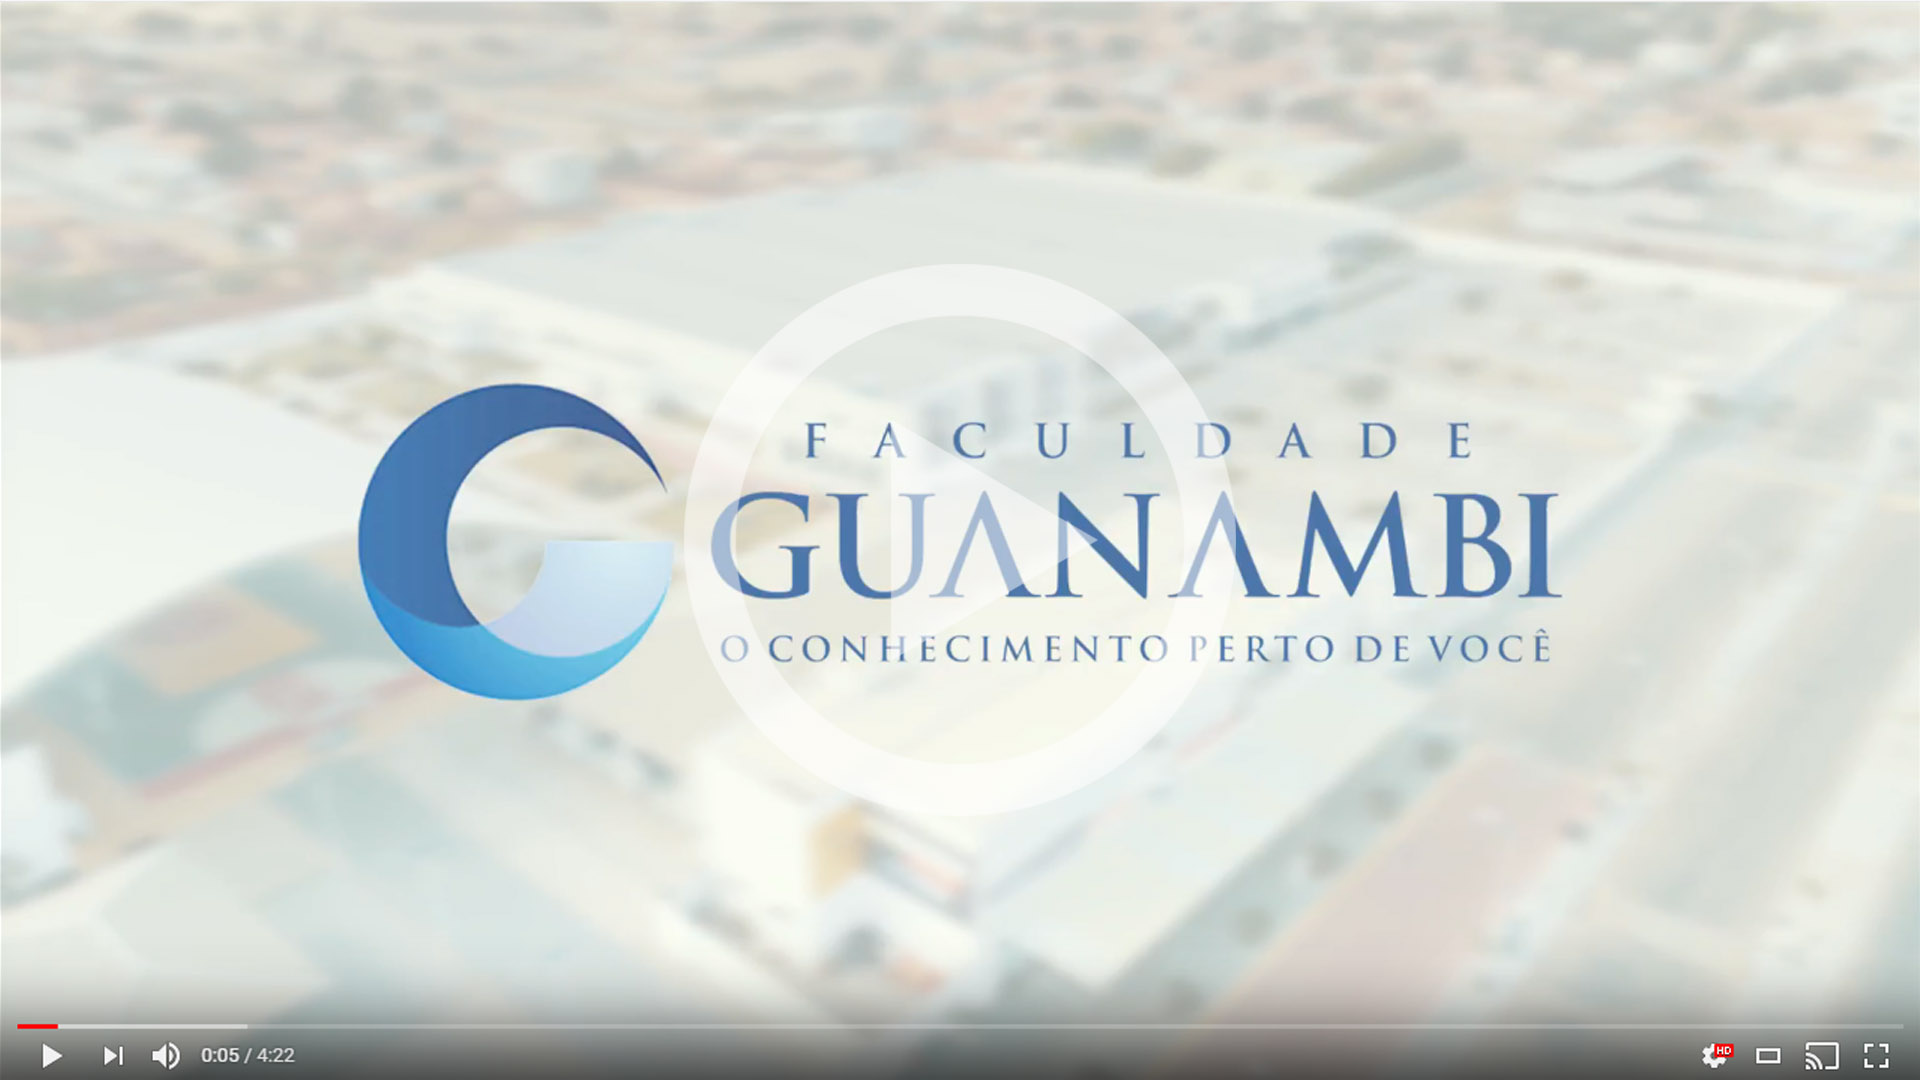 Faculdade Guanambi